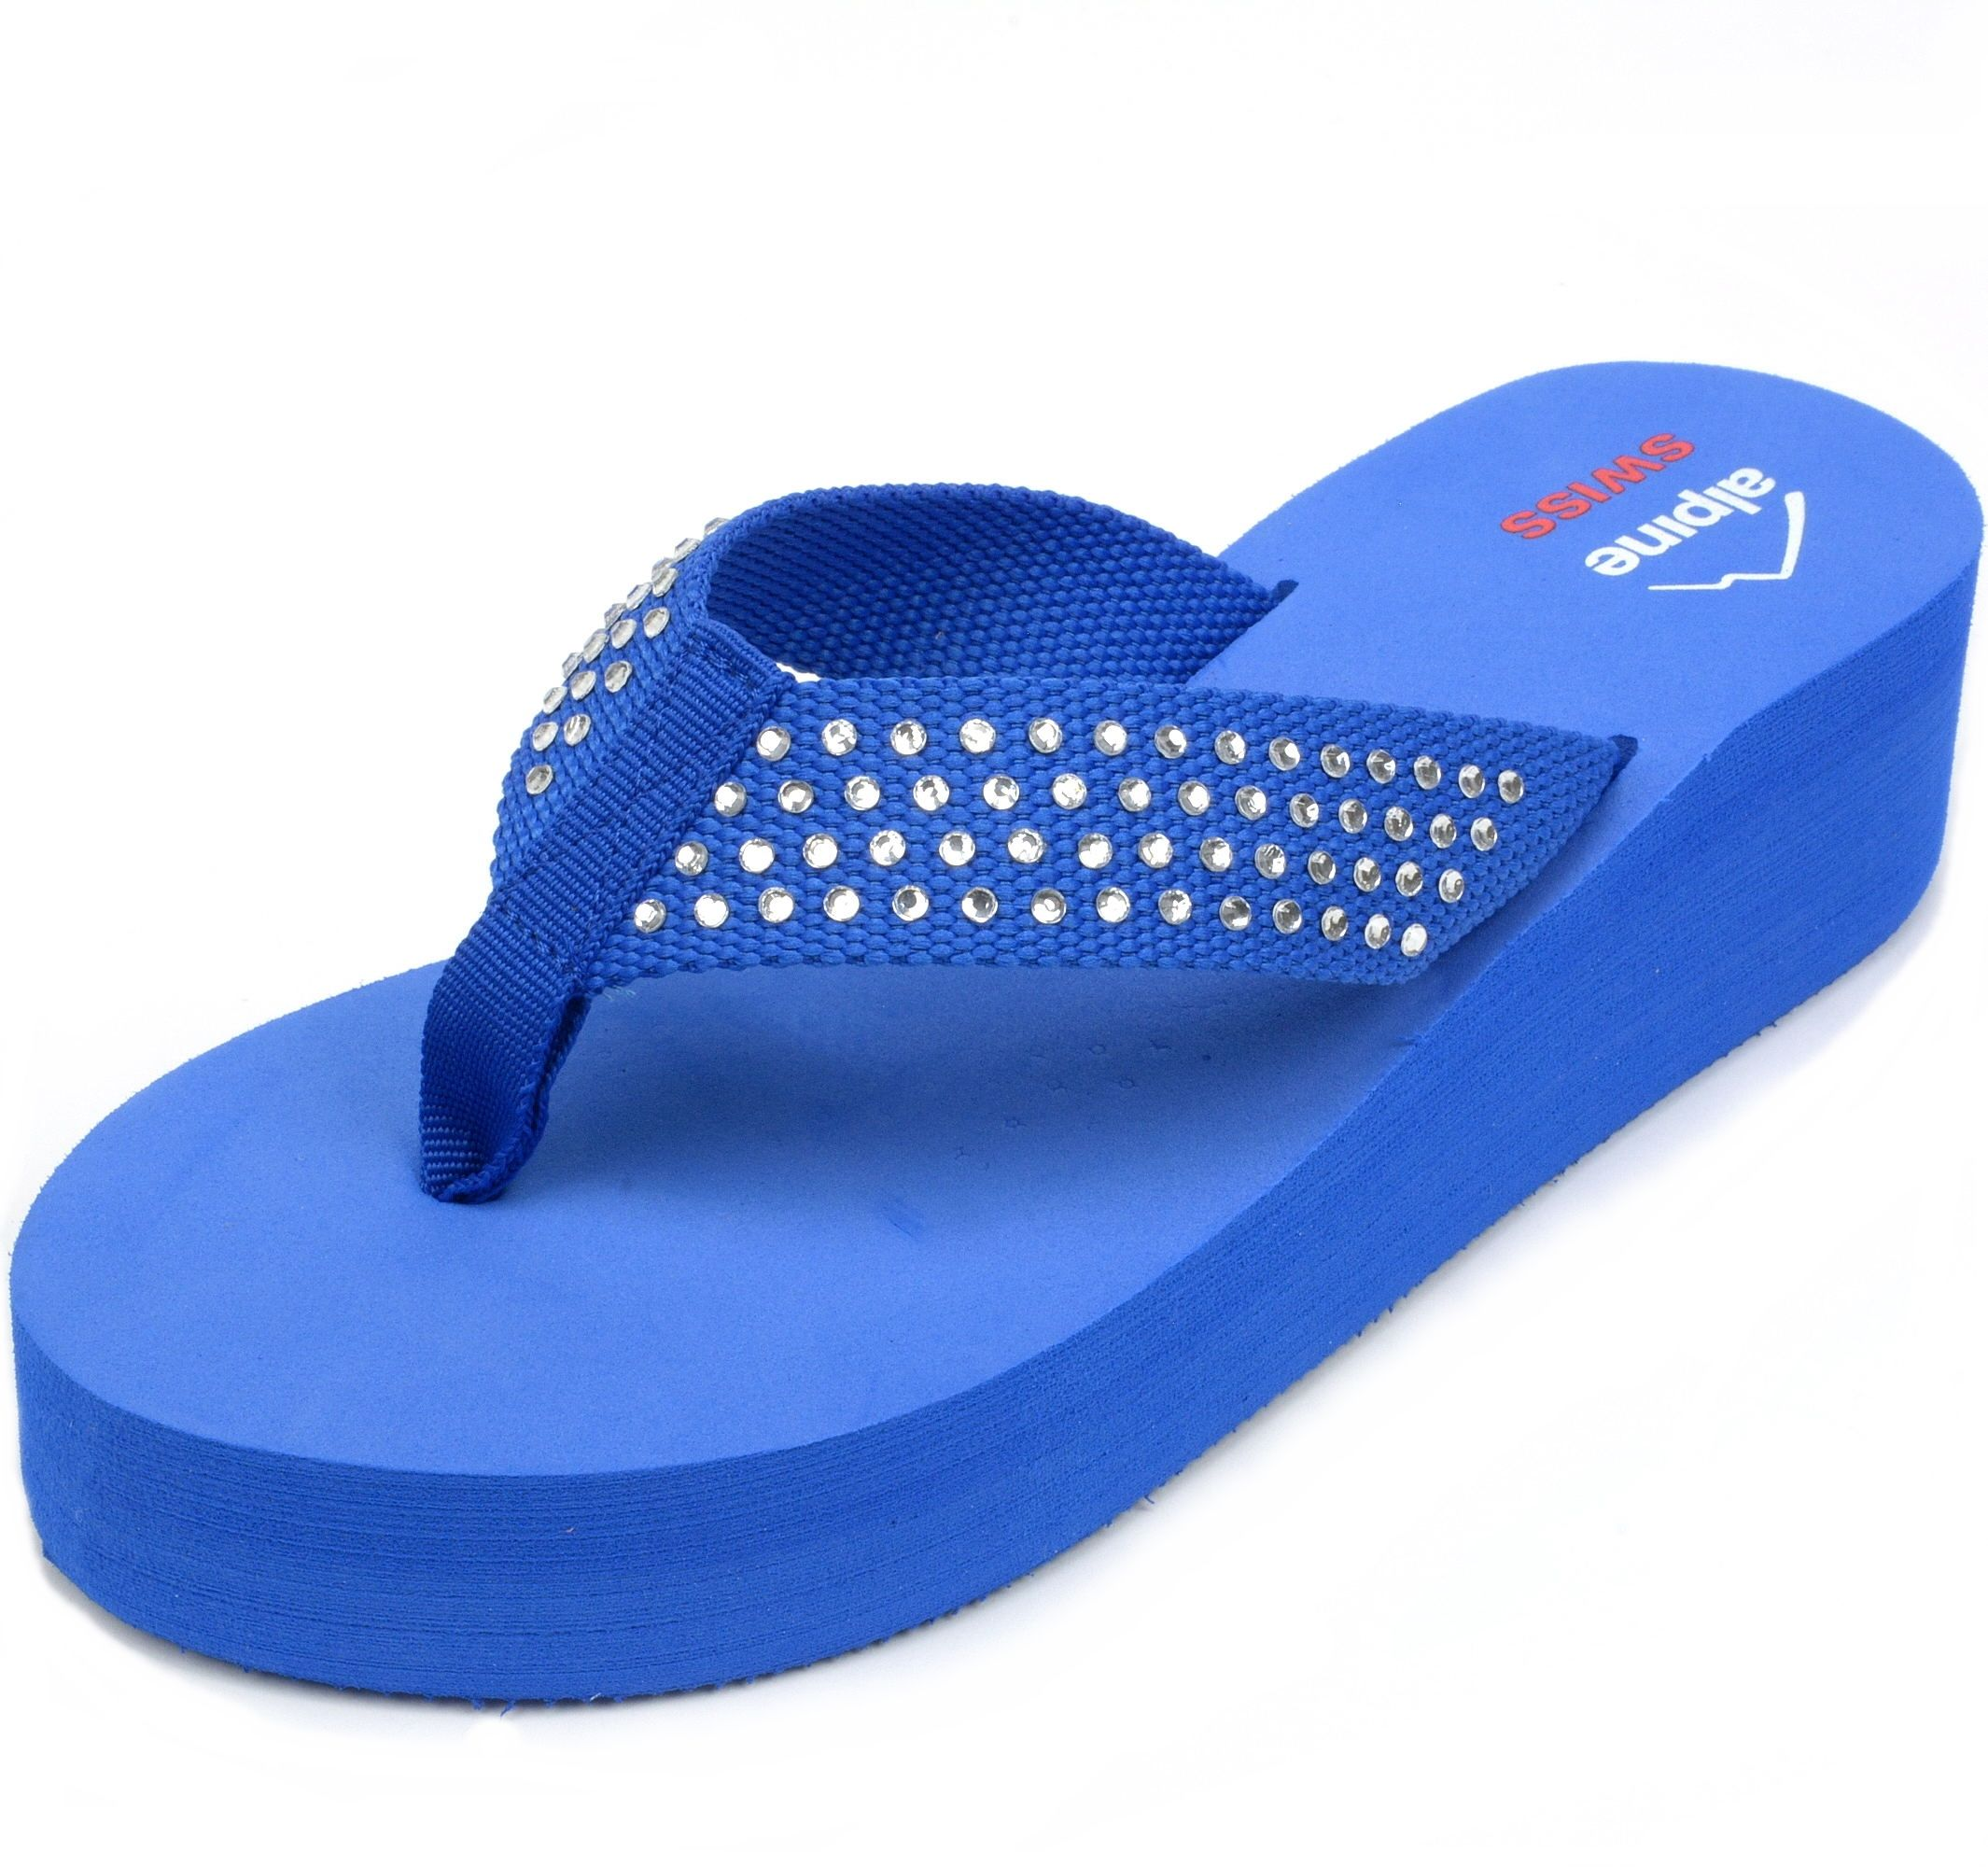 8a2381f2bc0 Alpine-Swiss-Womens-Flip-Flops-Thong-Sandals -Rhinestone-Wedge-High-Heel-Platform